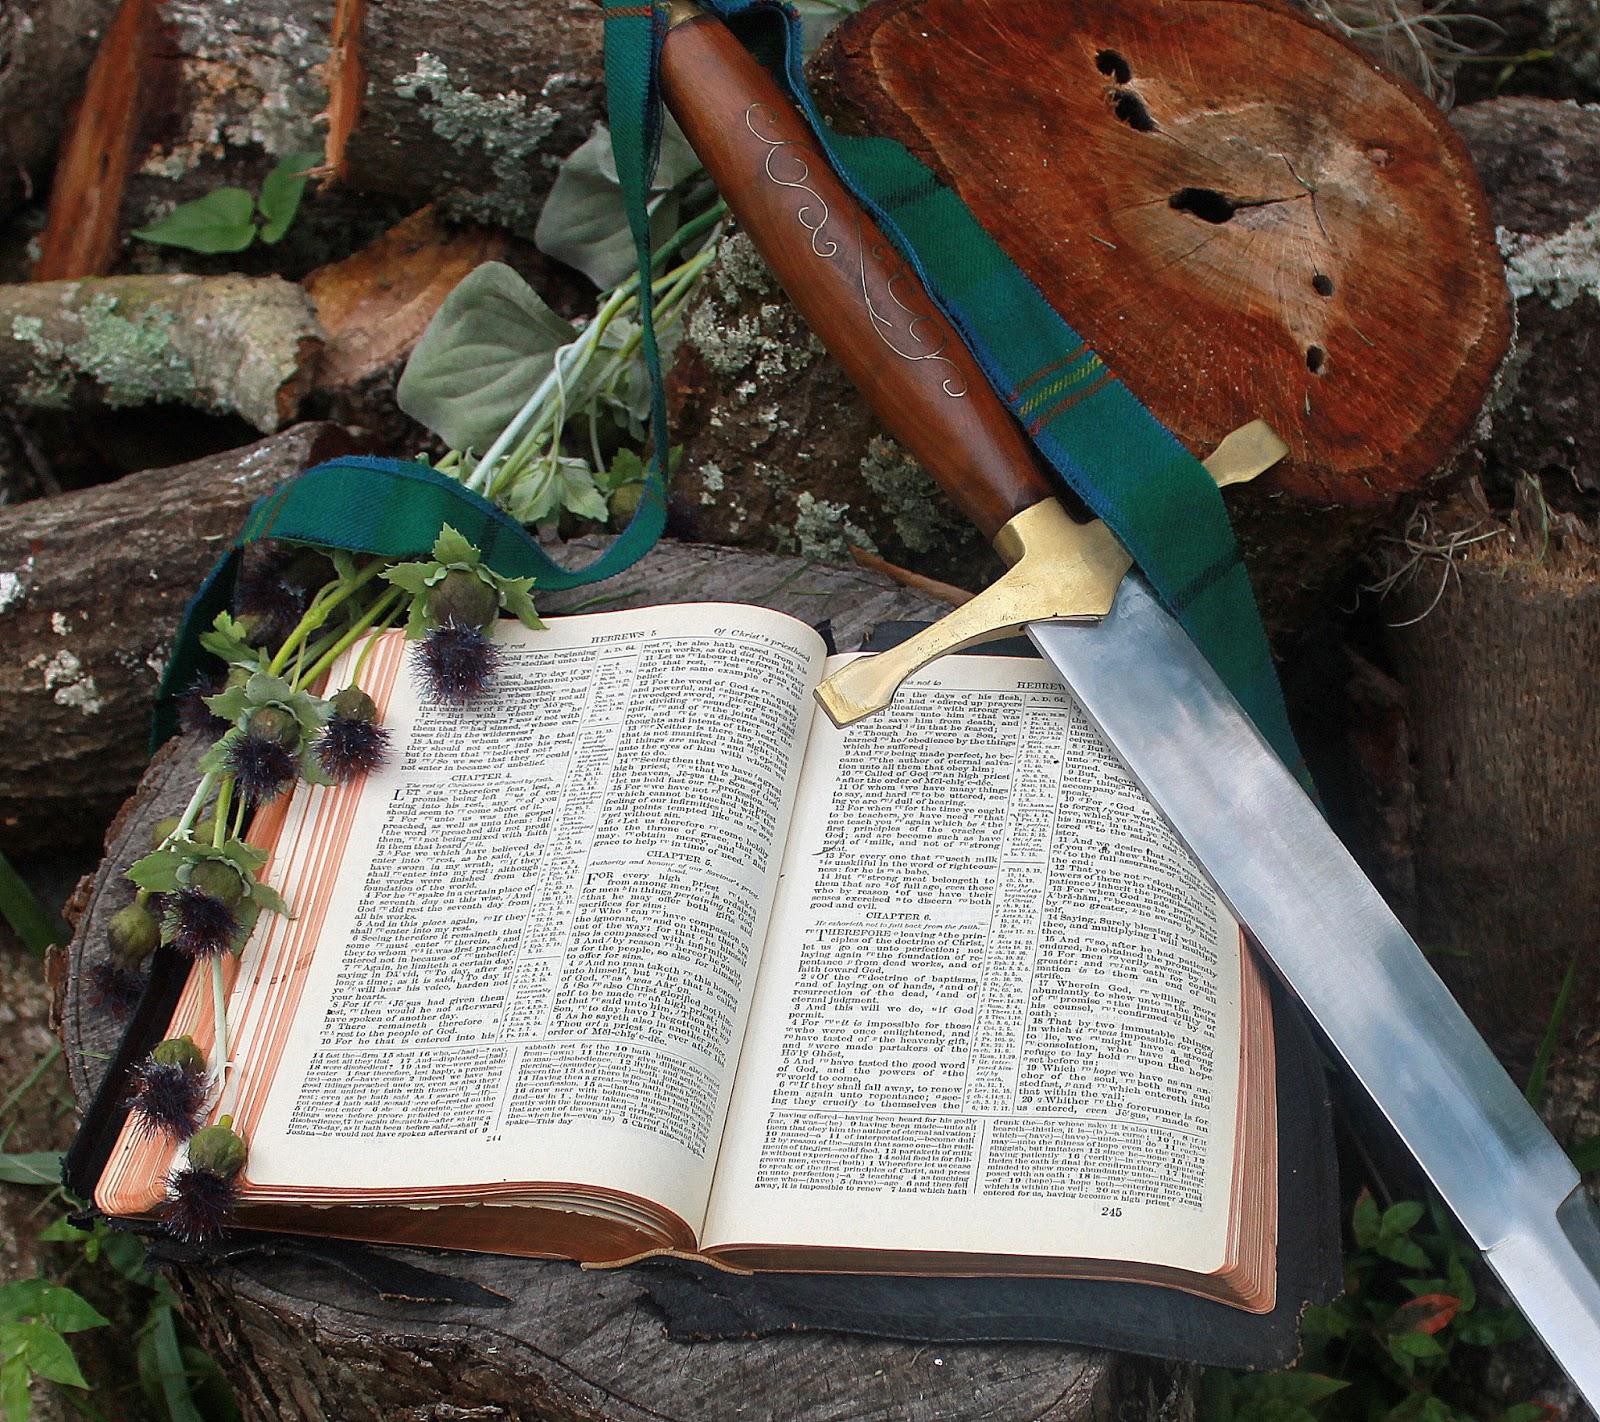 Sword In The Bible Quote: Ruth Carmichael Ellinger, The Shepherdess Speaks